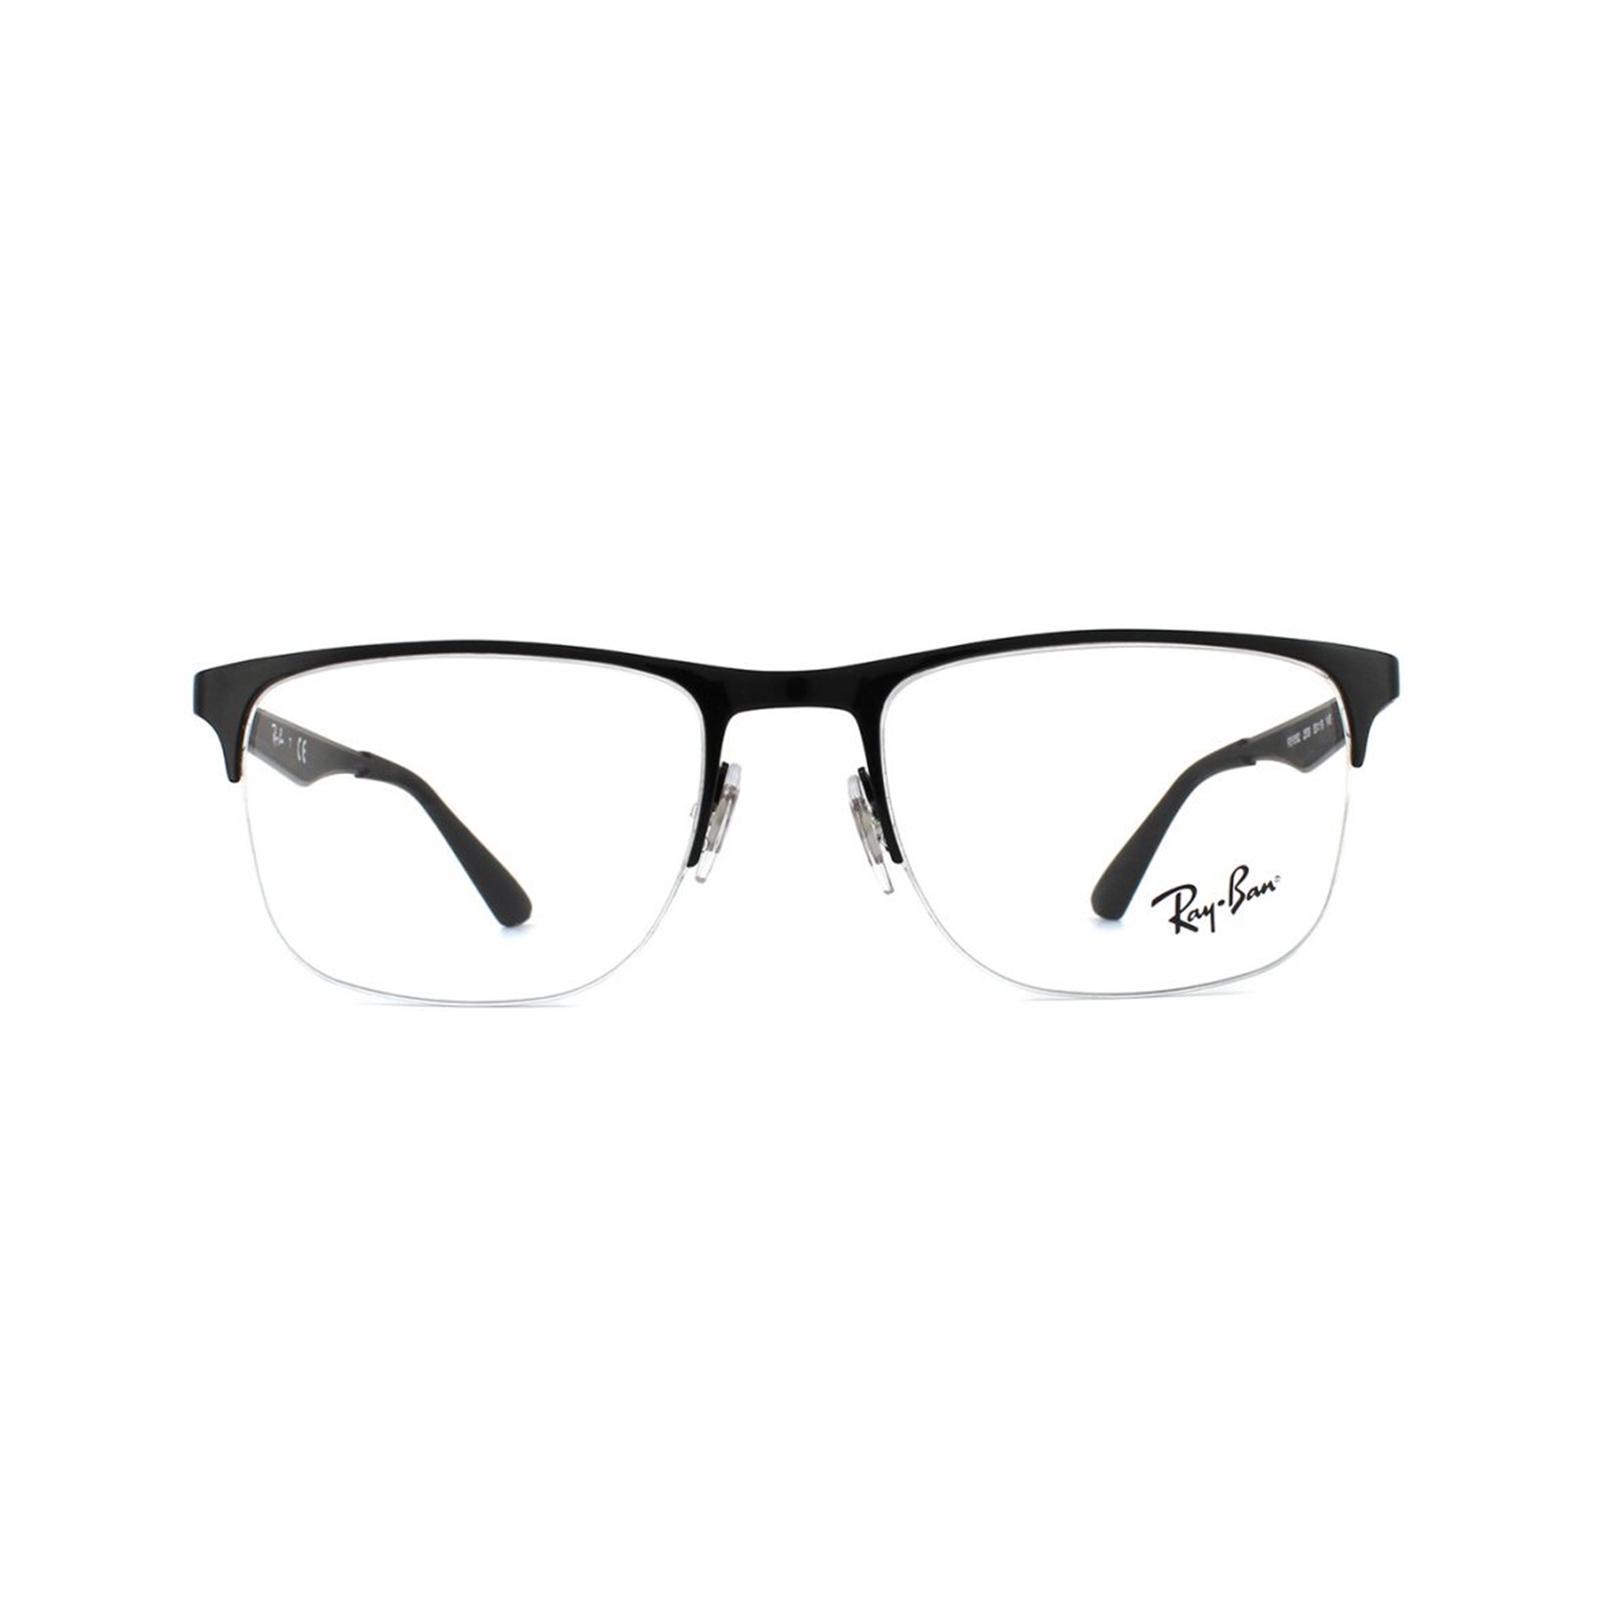 c0338c60a7 Sentinel Ray-Ban Glasses Frames RX 6362 2509 Shiny Black Mens 53mm